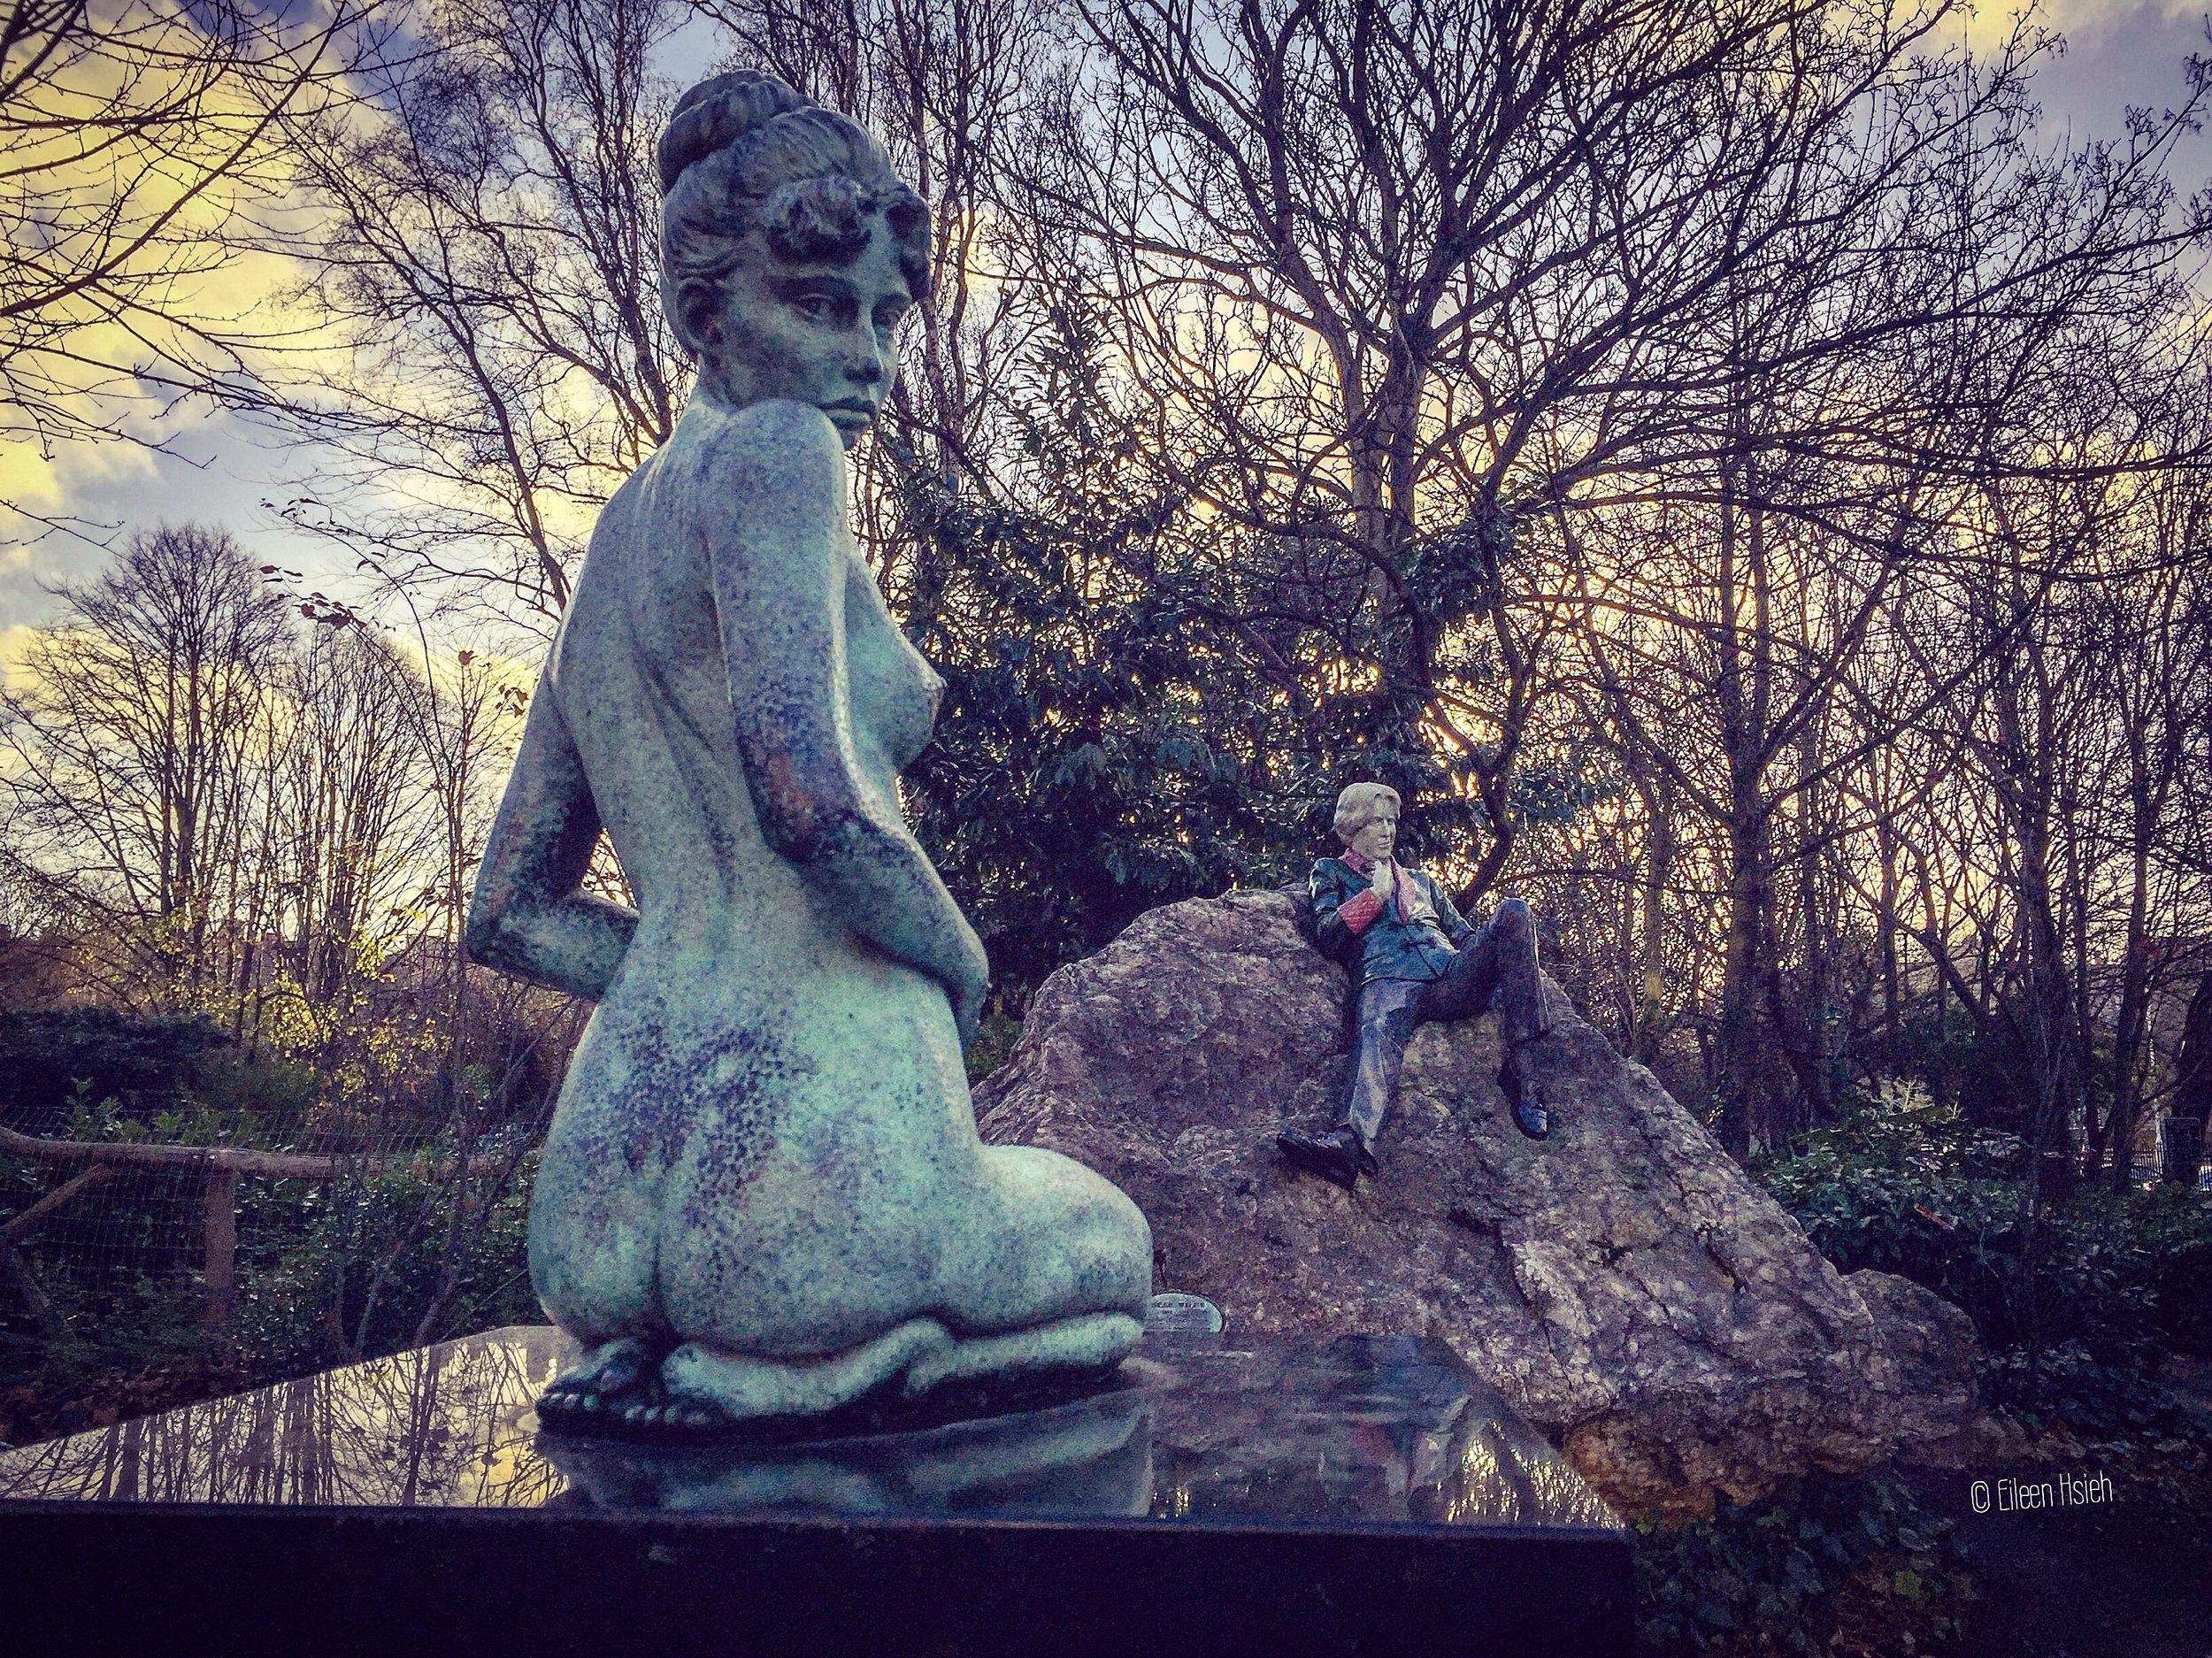 Dublin Oscar Wild Constance statue followthatbug follow that bug eileen hsieh